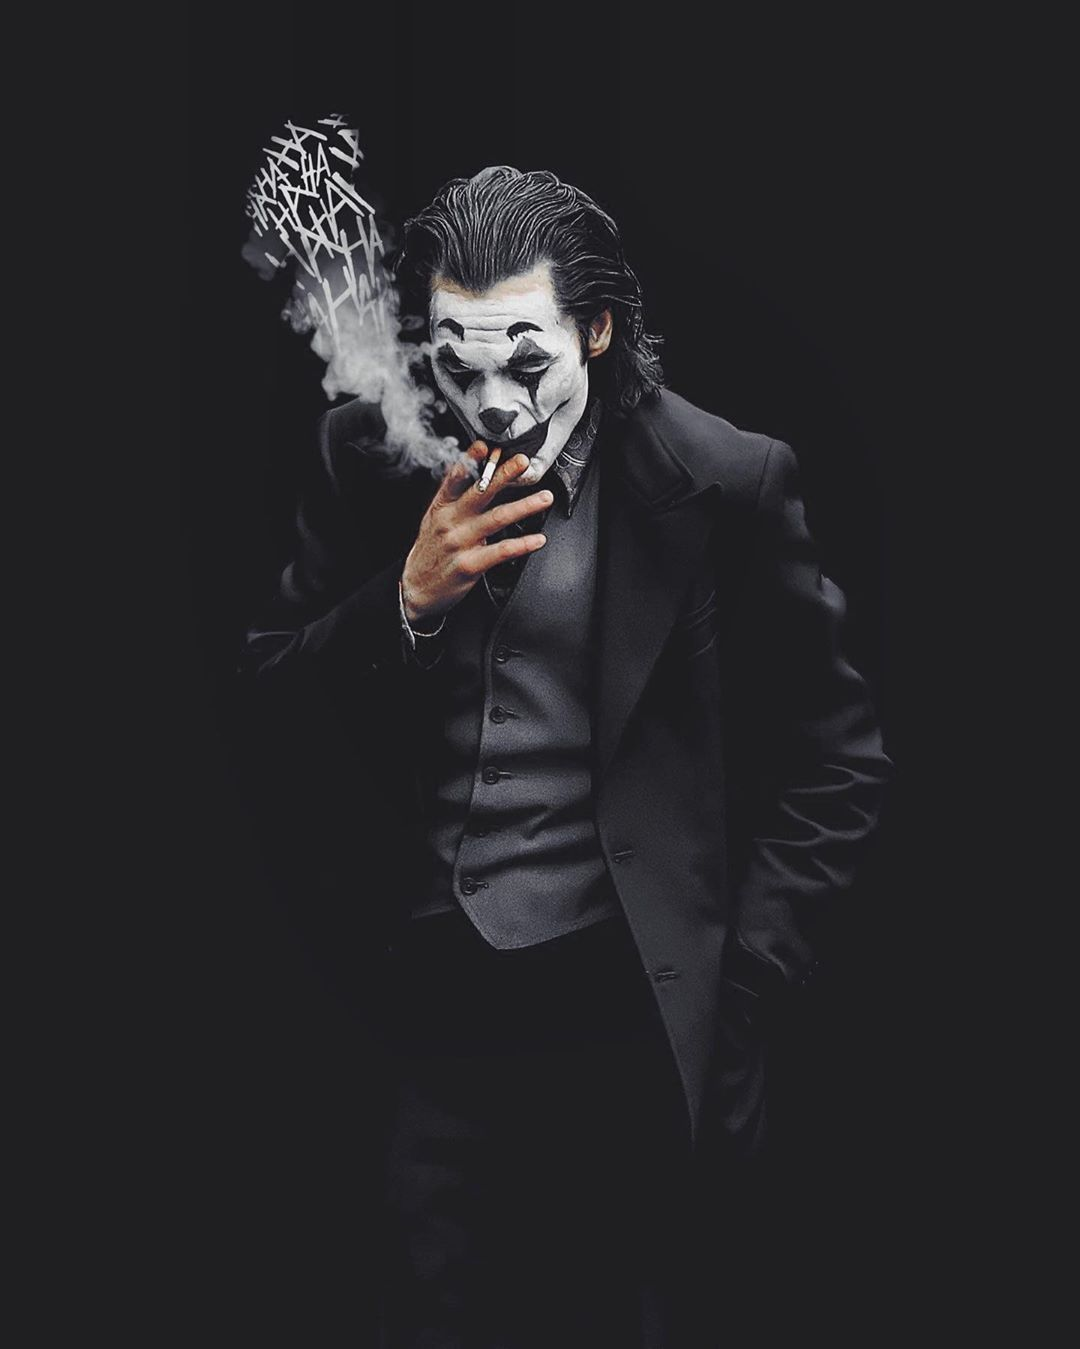 Black Joker Wallpapers Seniman Jalanan Seniman Gambar Karakter